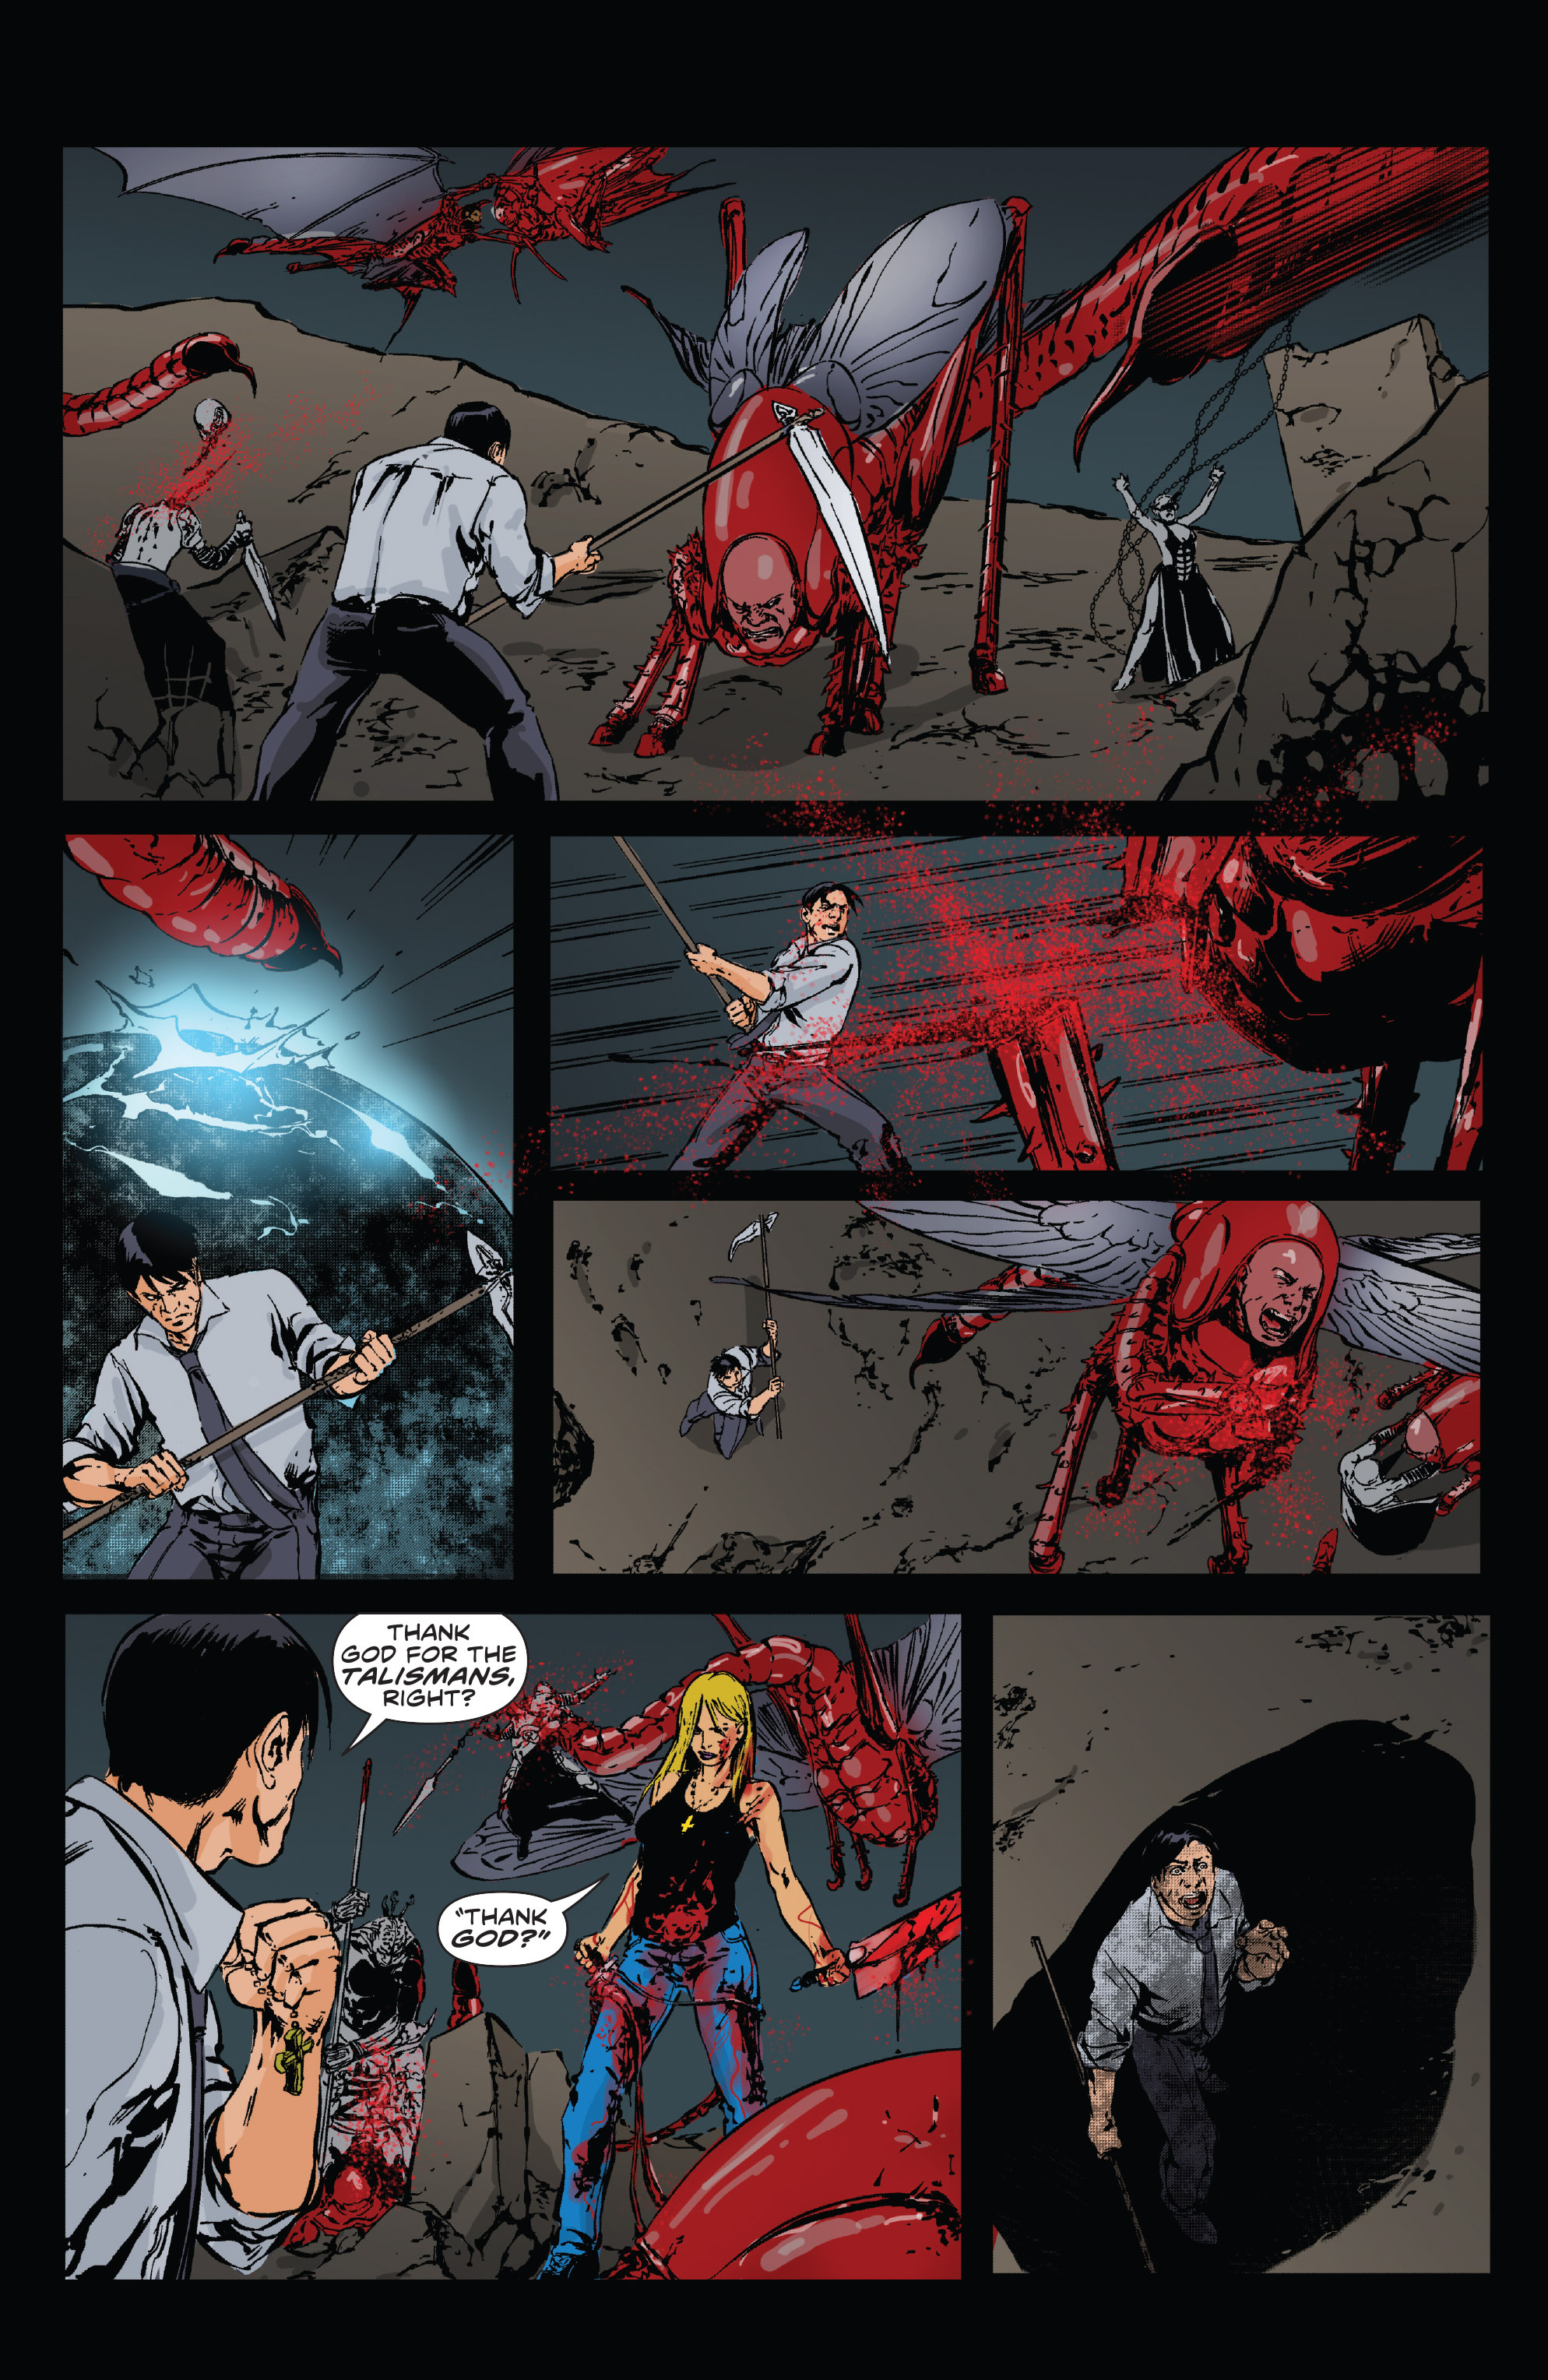 Read online Clive Barker's Hellraiser: The Dark Watch comic -  Issue # TPB 3 - 91